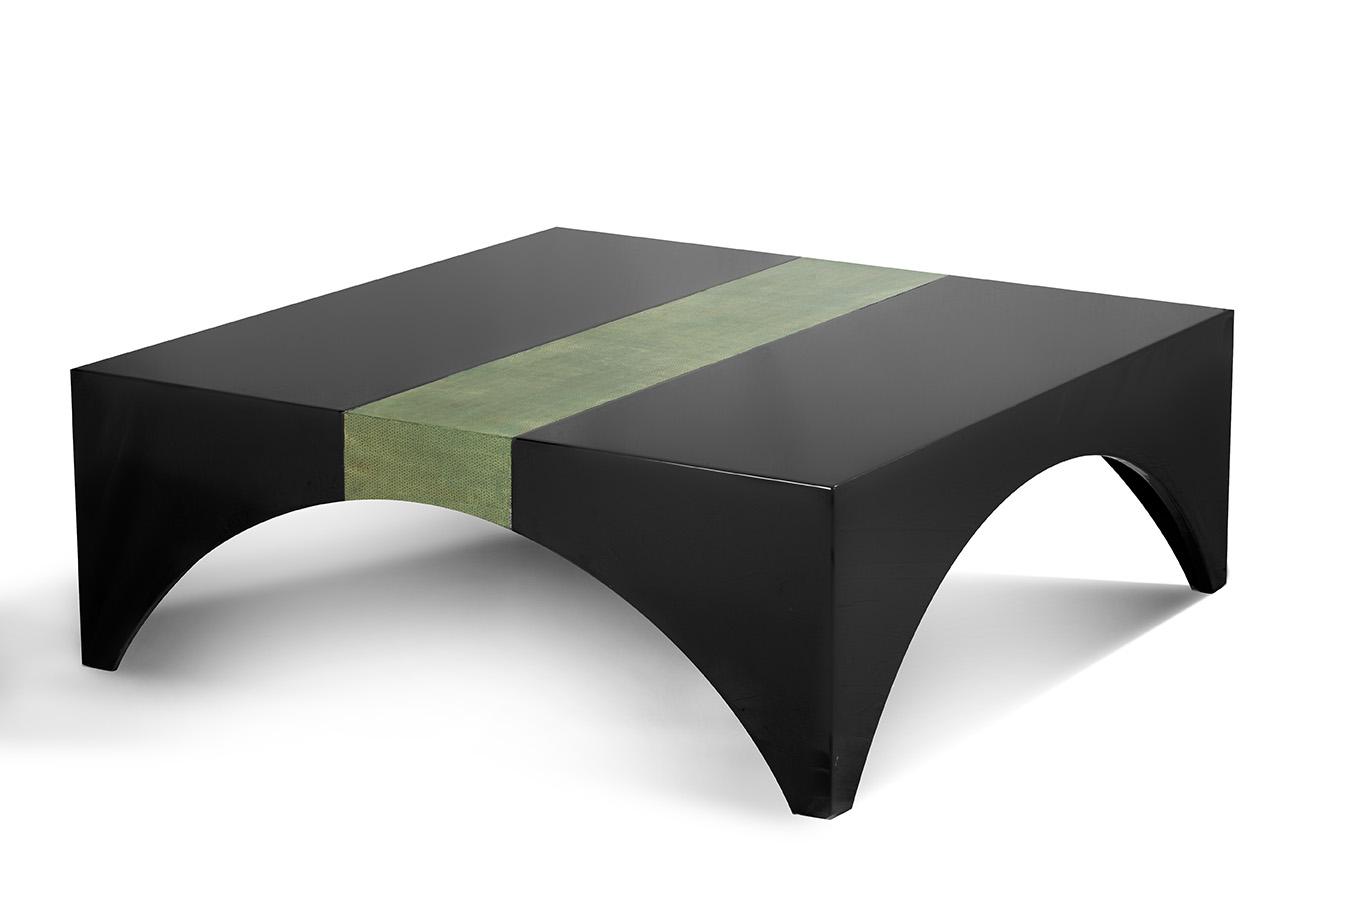 Unique low square coffee table